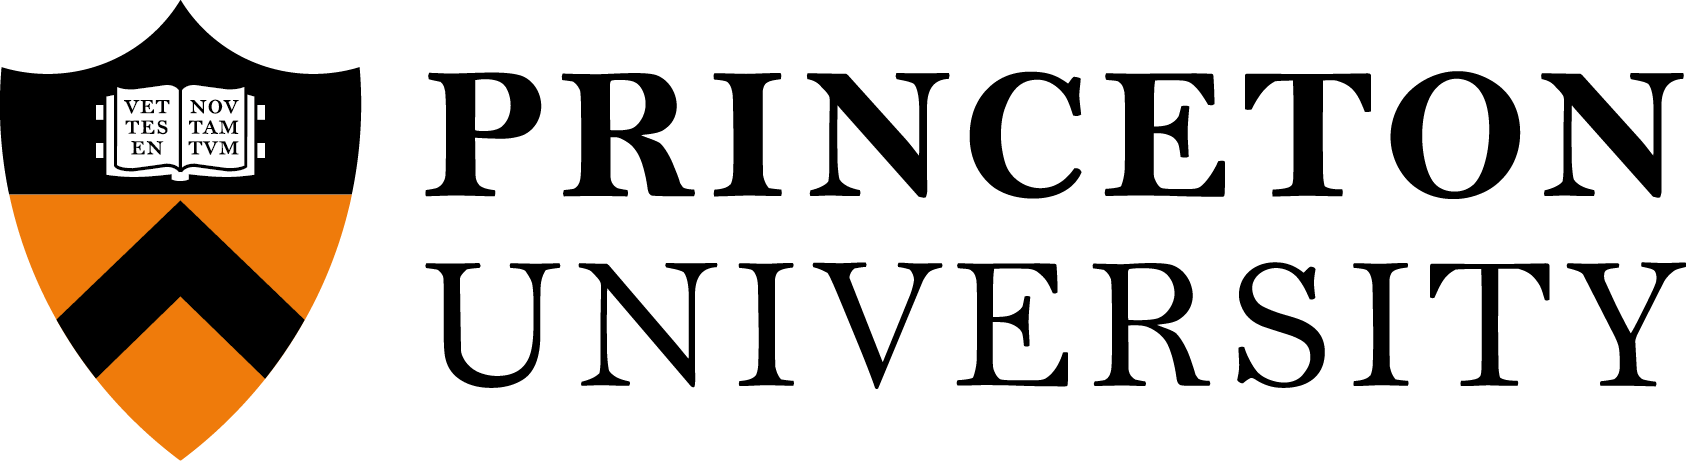 Princeton University Arm&Emblem [princeton.edu] png